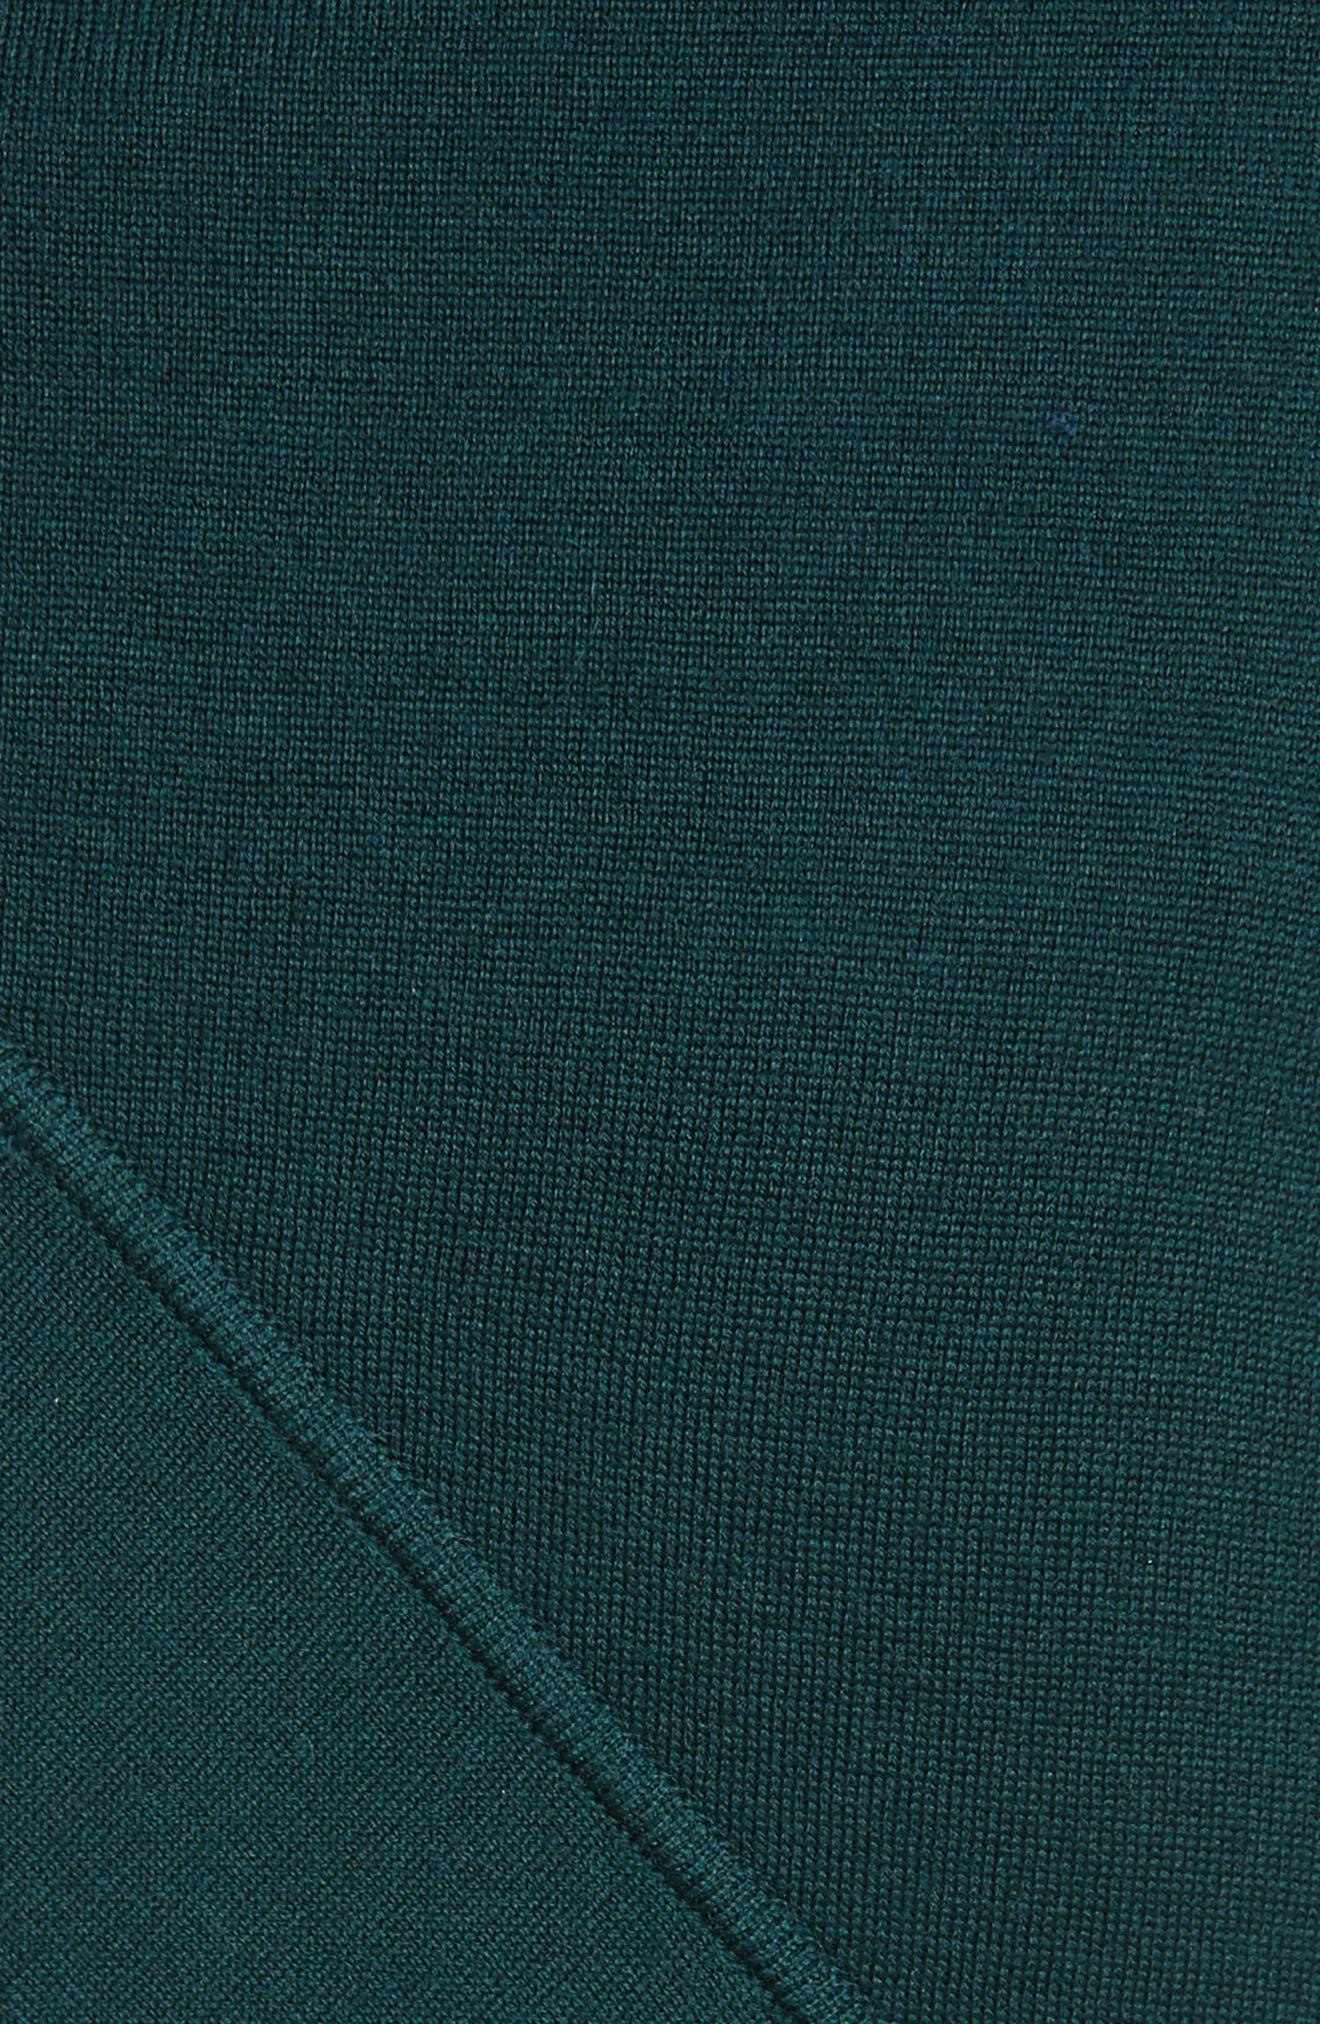 Reversible Asymmetrical Knit Midi Skirt,                             Alternate thumbnail 6, color,